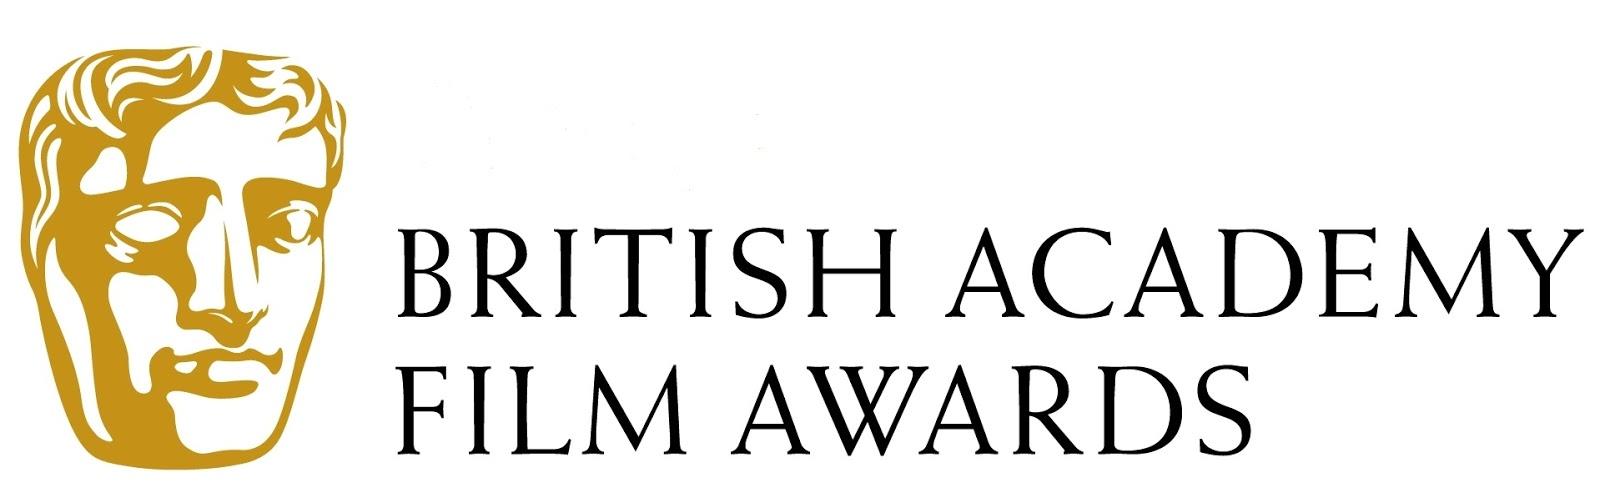 British Academy Film Awards British Academy Film Awards 2014 67th Annual BAFTA Nominations